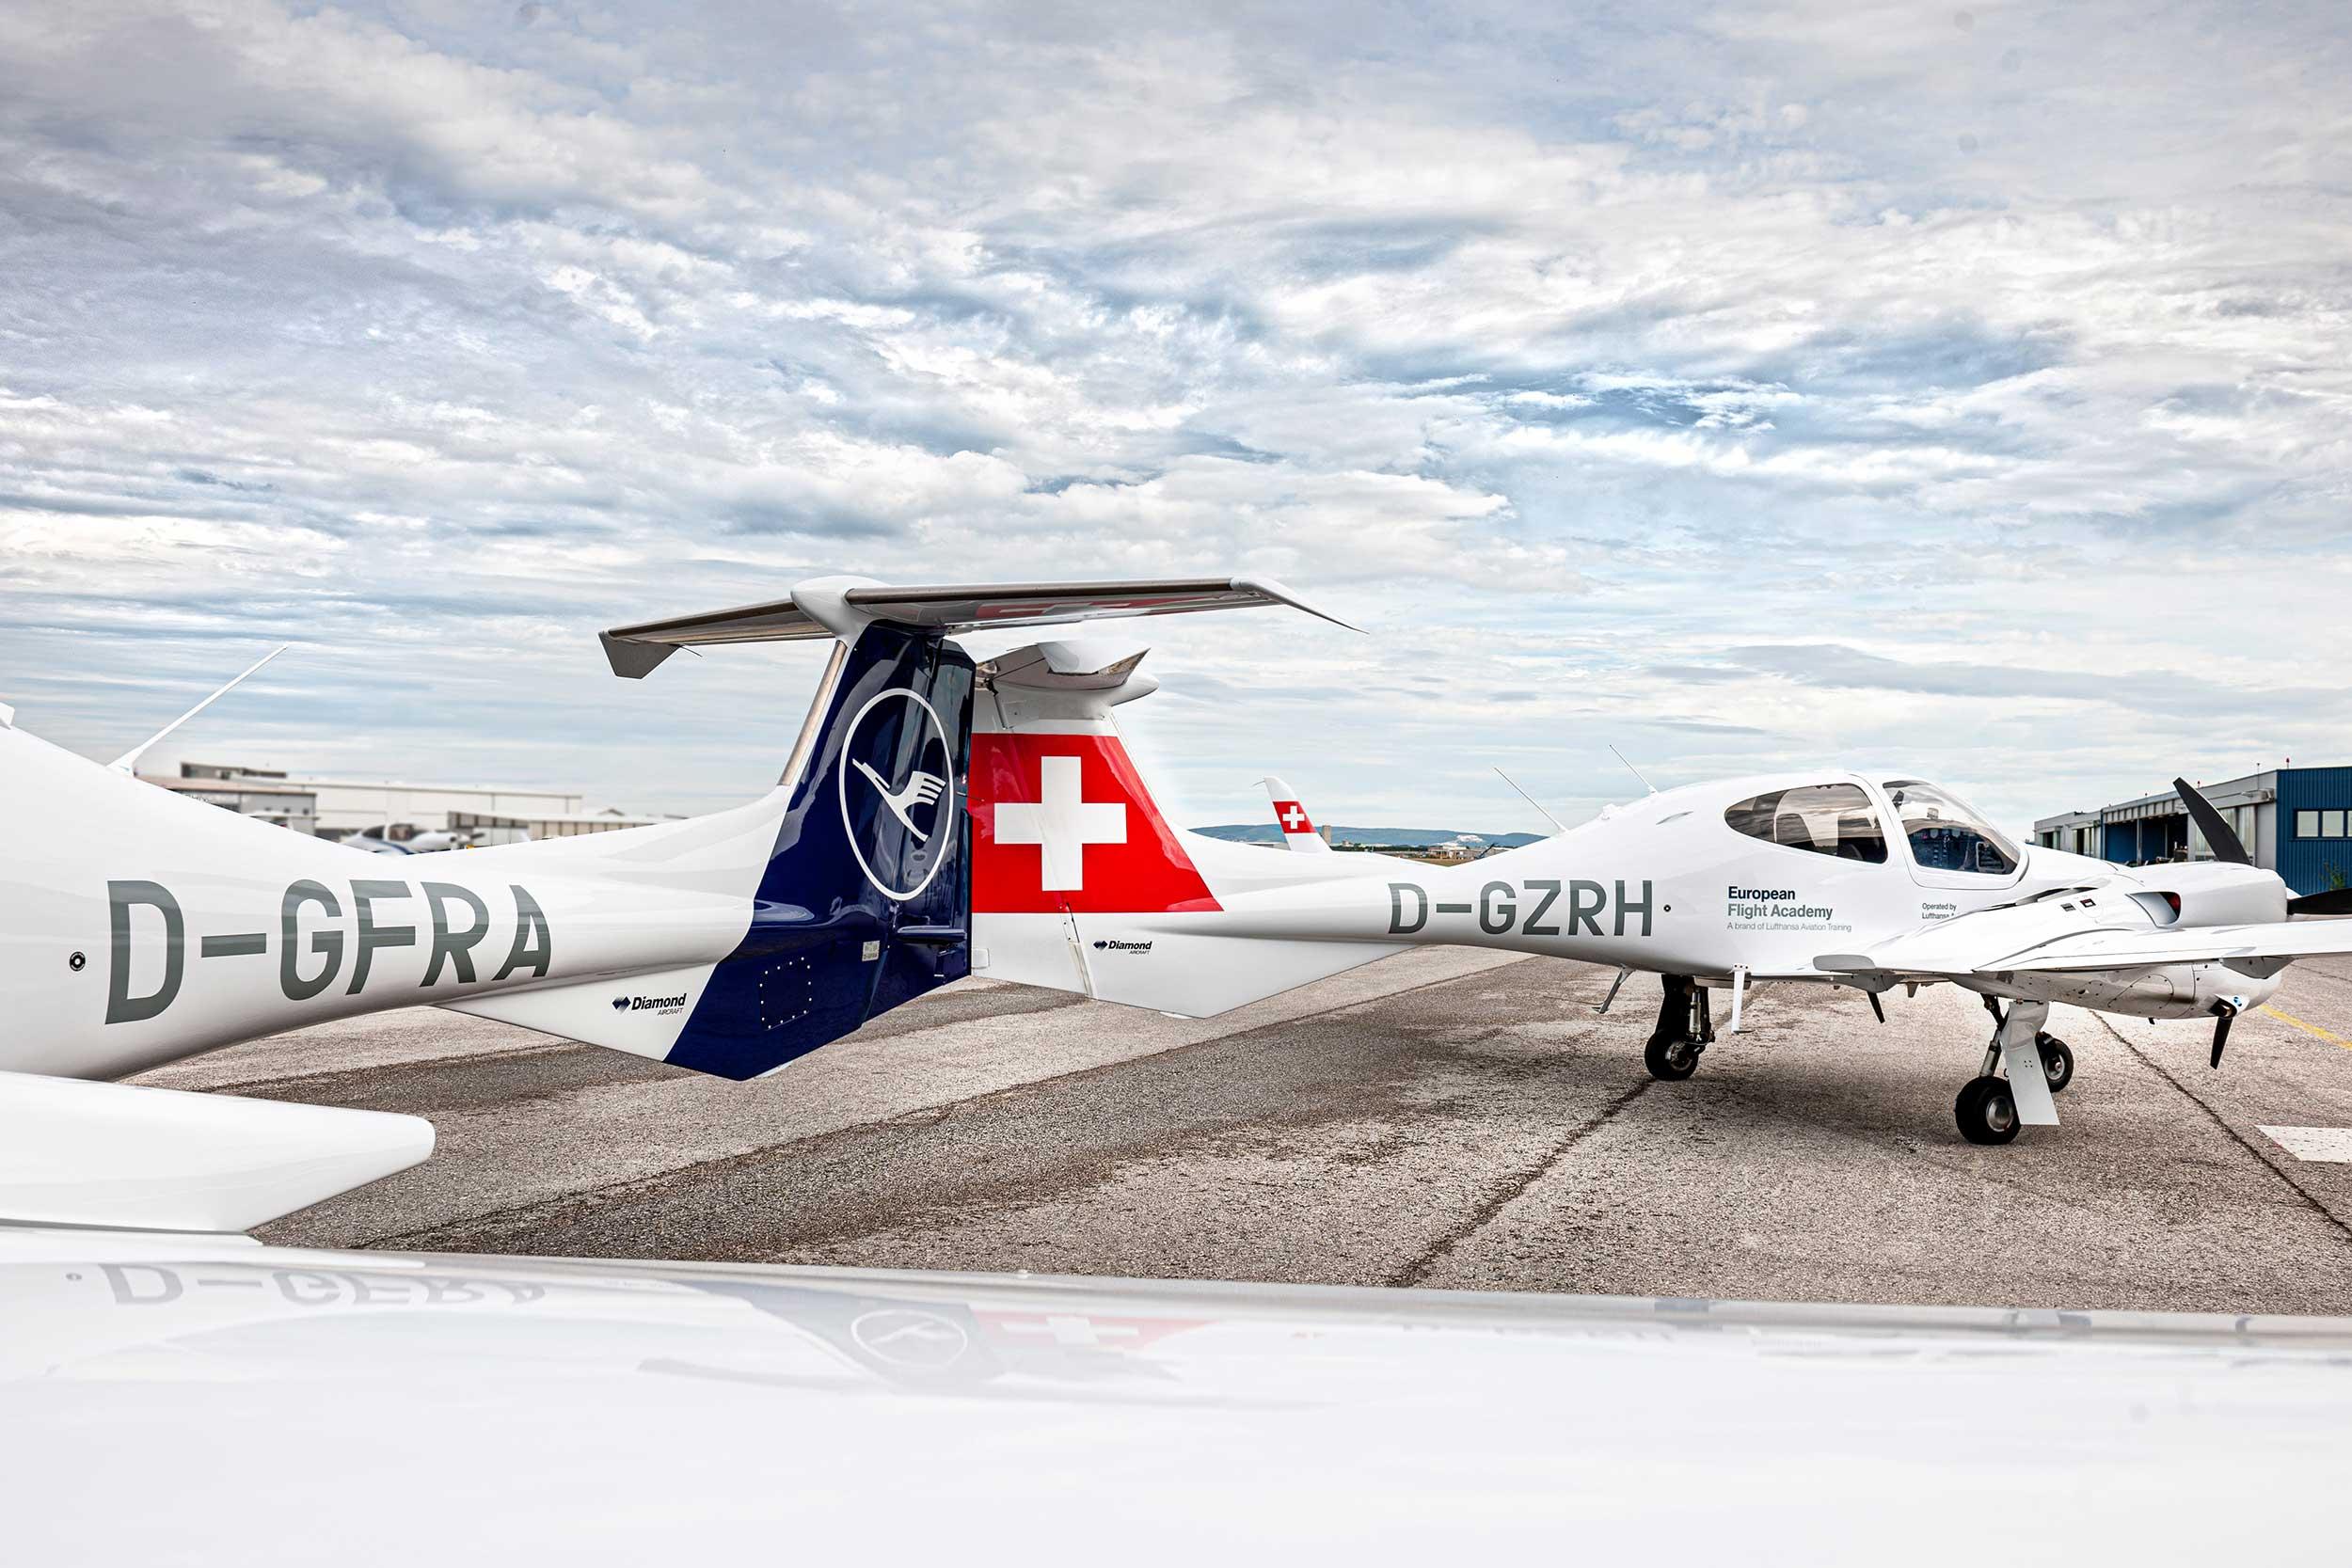 Luftansa Diamond aircraft